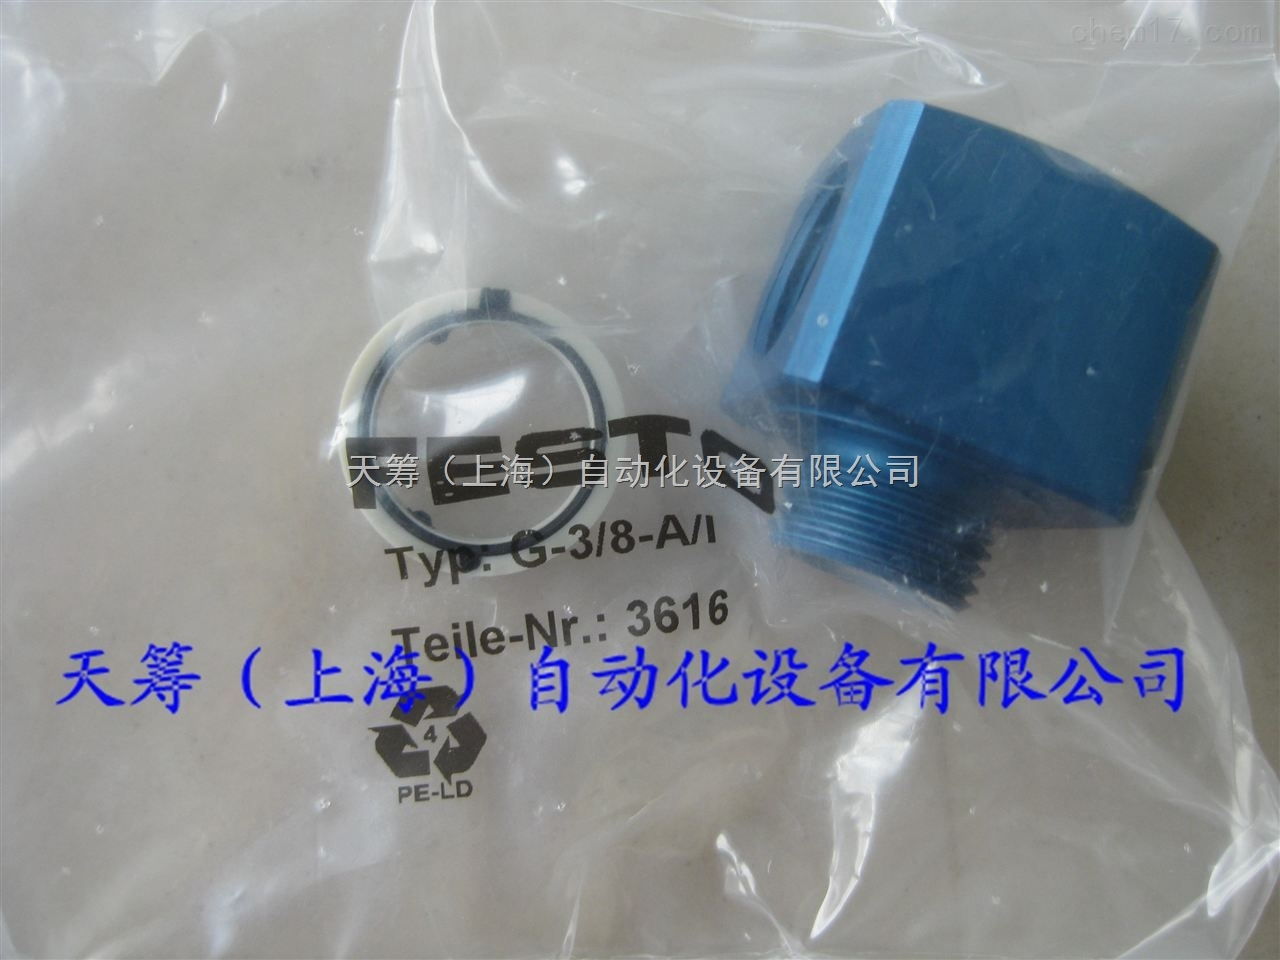 FESTO产品L型接头G-3/8-A/I